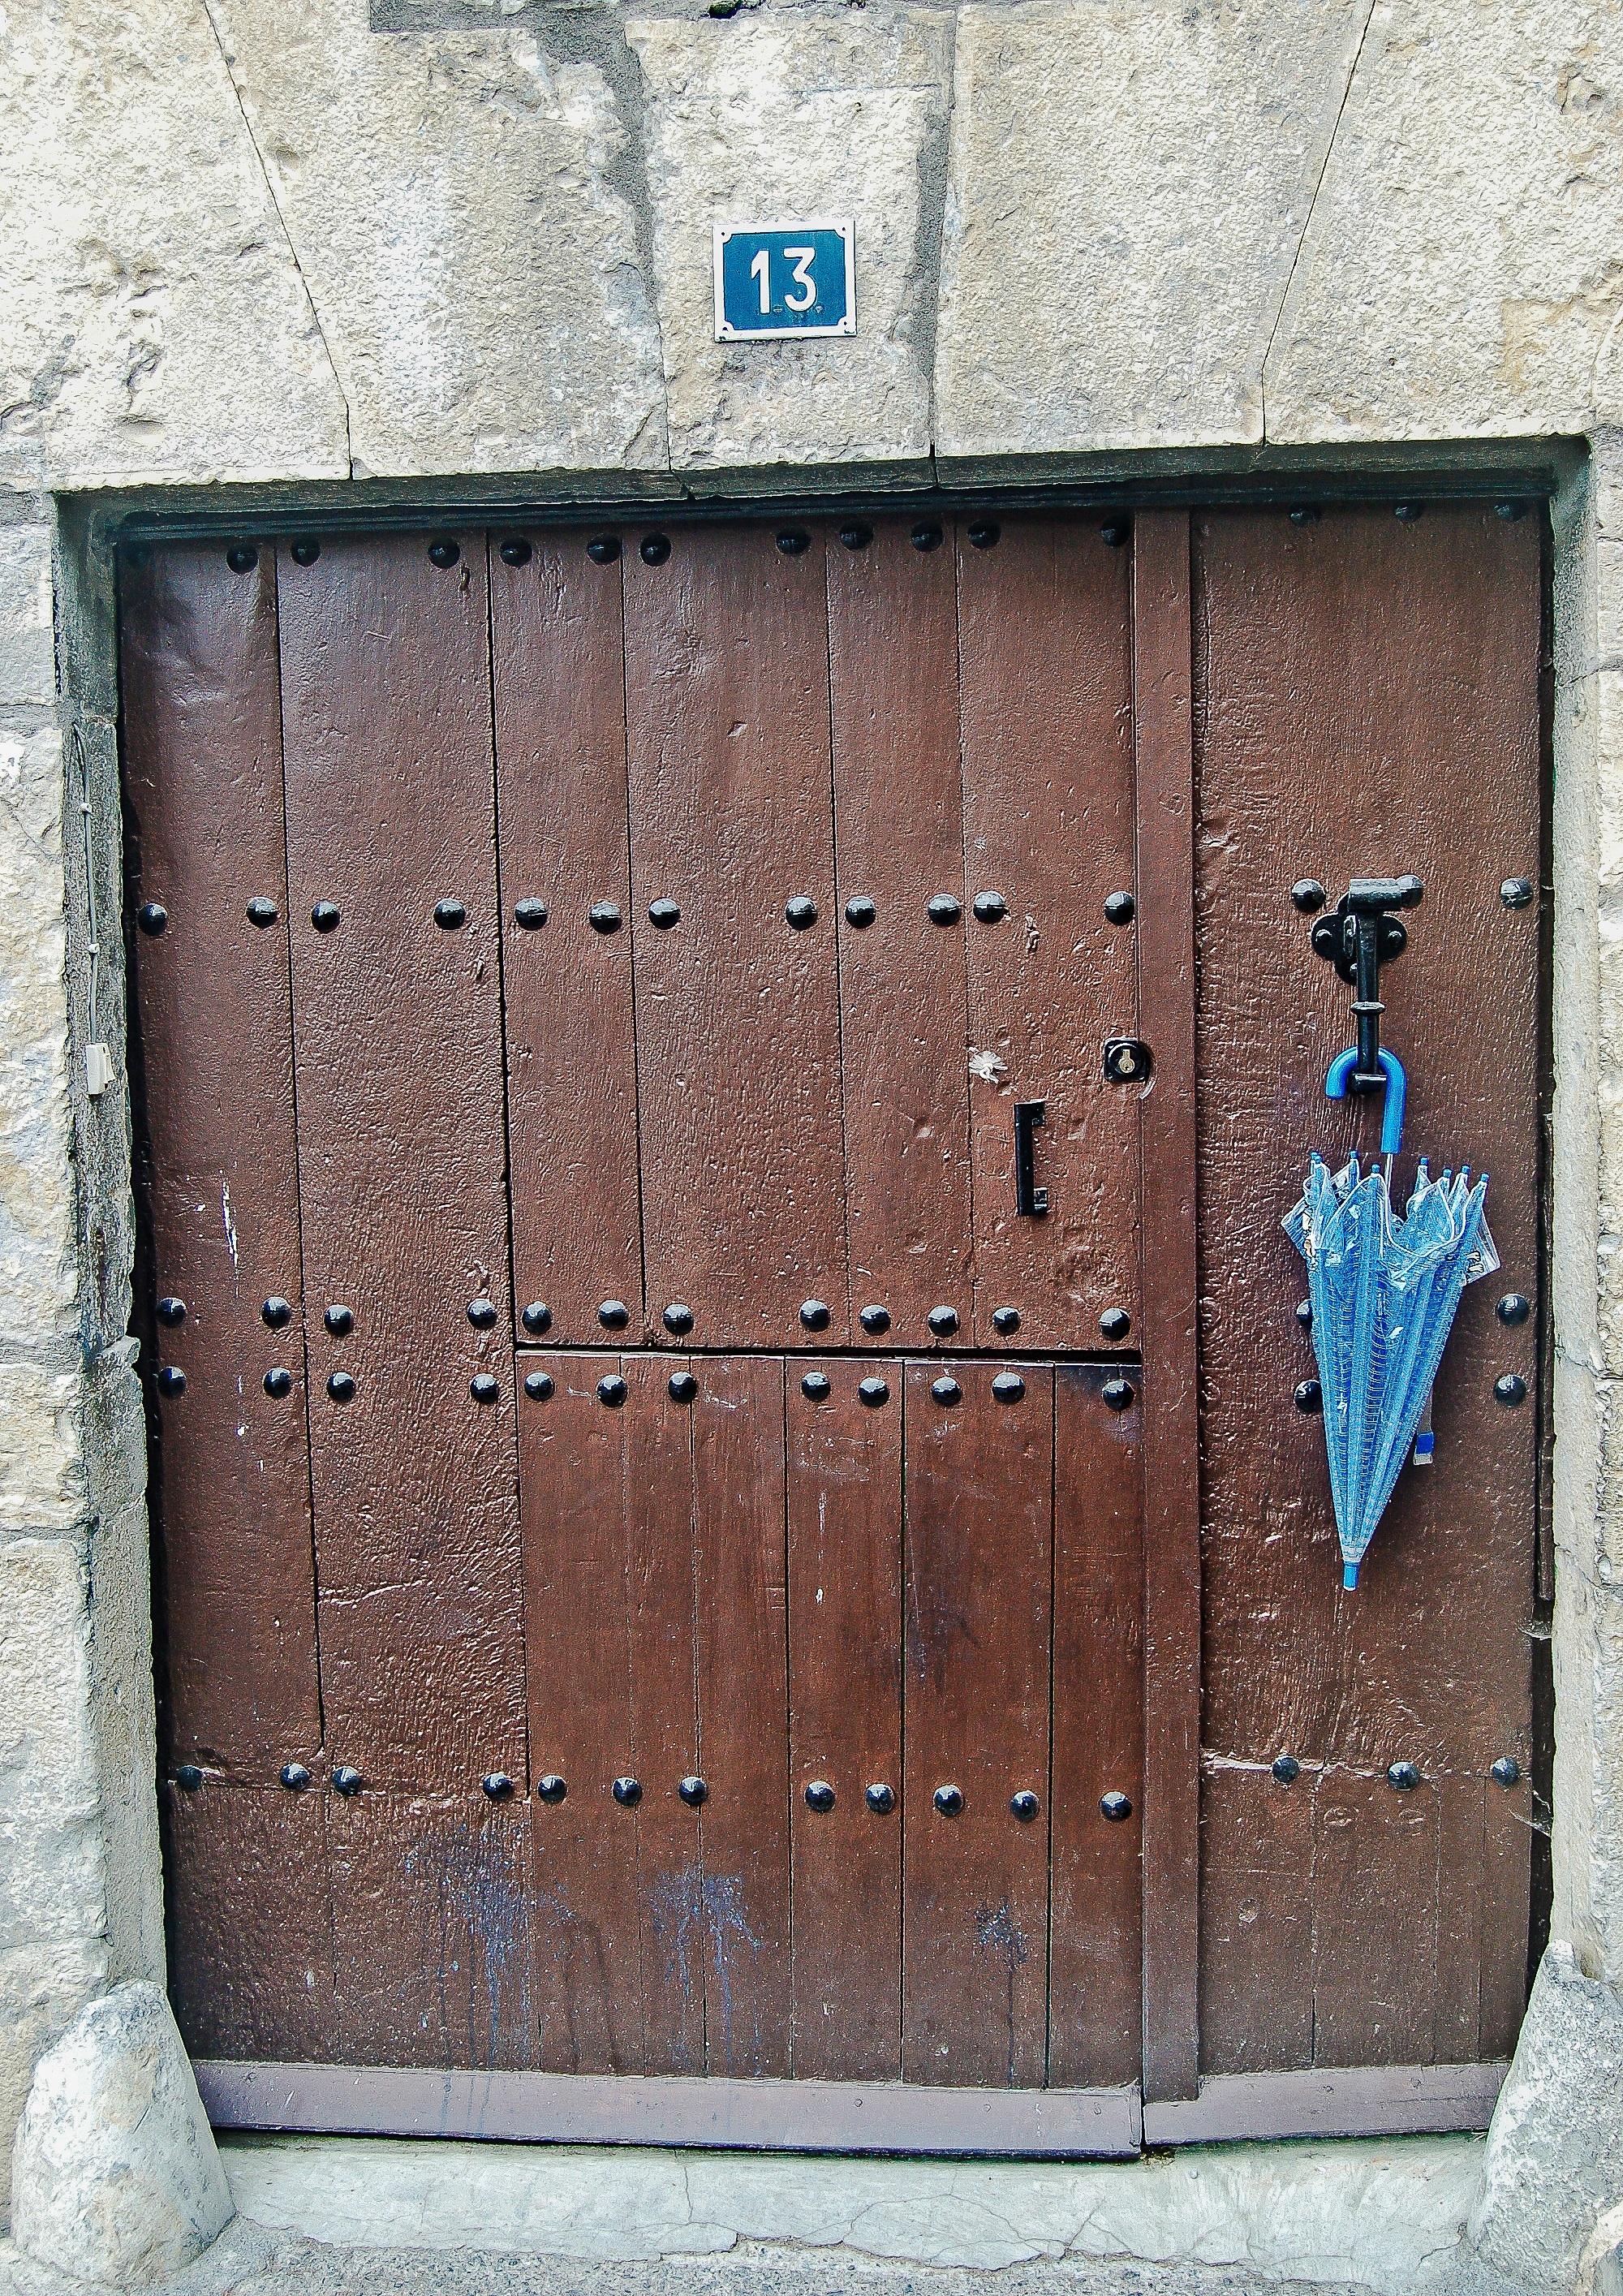 Beautiful Architecture Wood House Window Wall Umbrella Metal Brown Facade Blue Gate  Door Design Input Portal Man